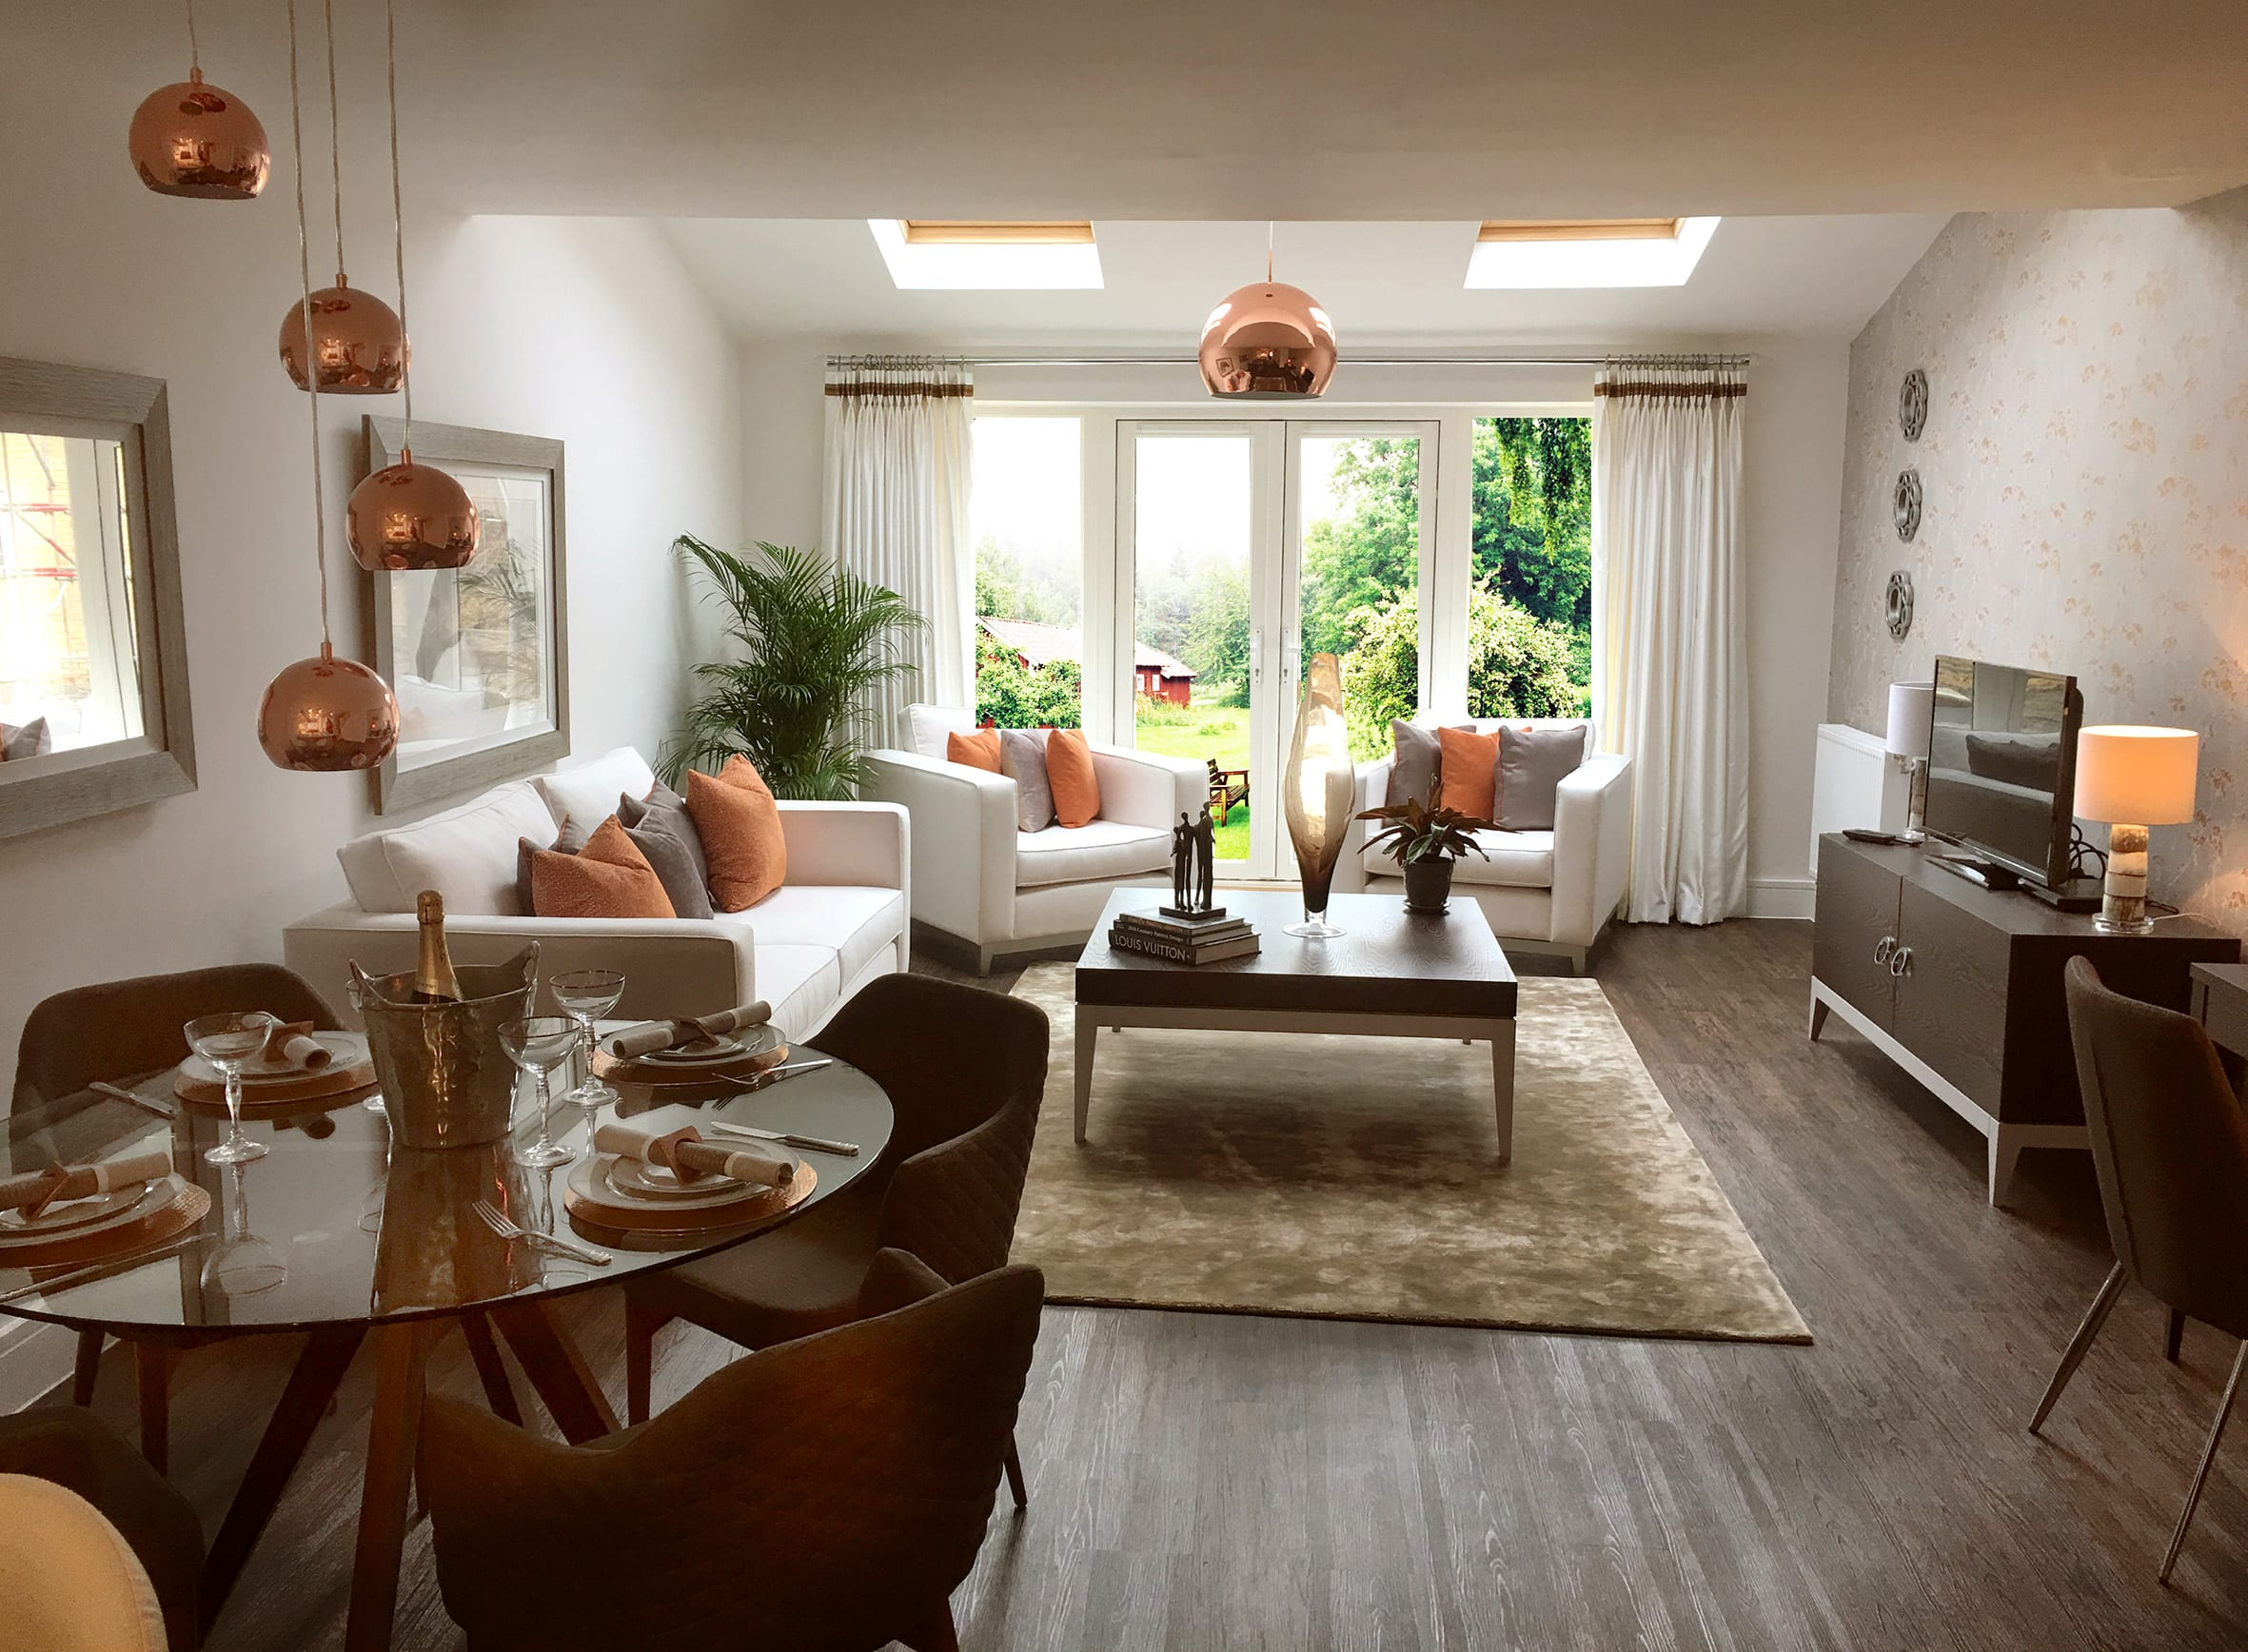 Circular dining room decor ideas